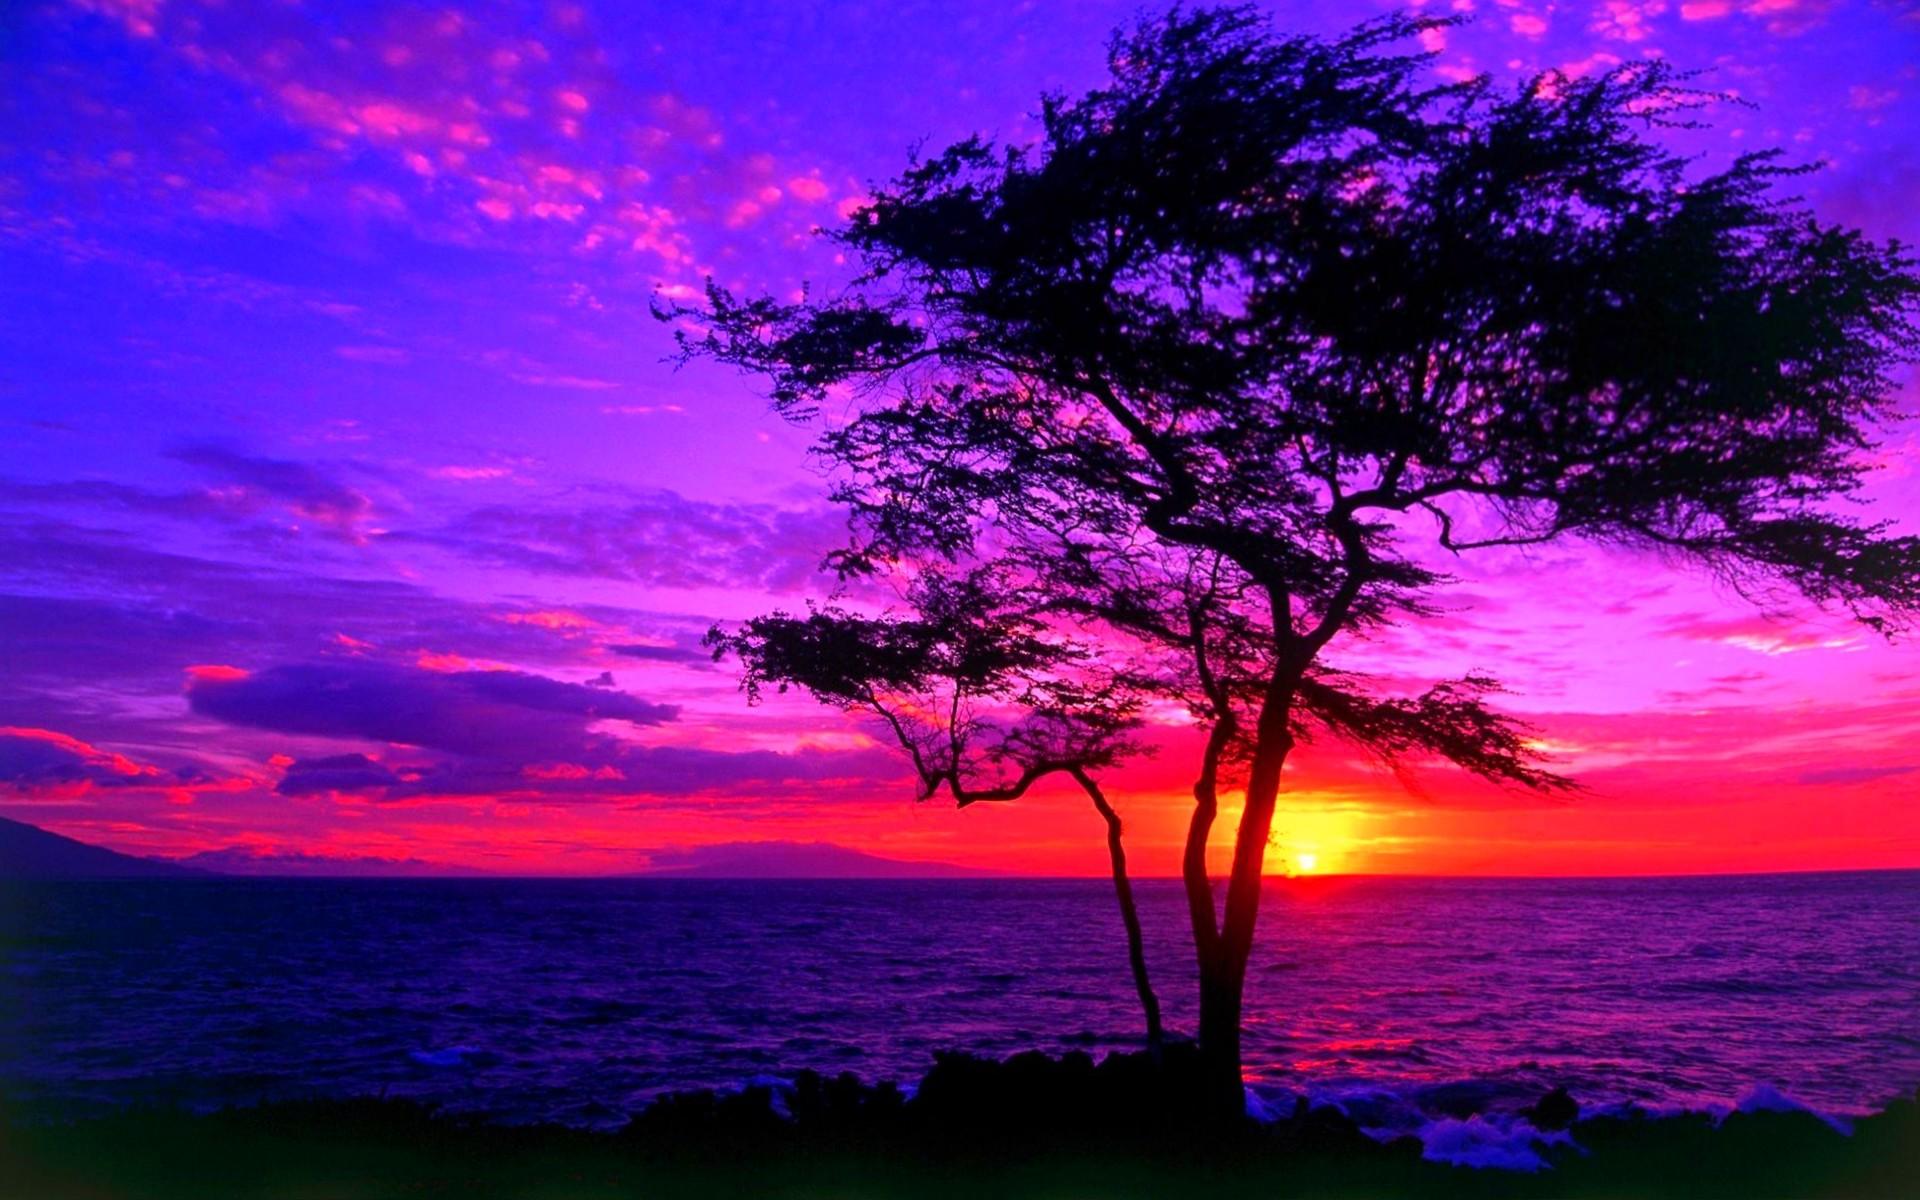 Beautiful sunset wallpapers wallpapertag for Sfondi desktop tramonti mare